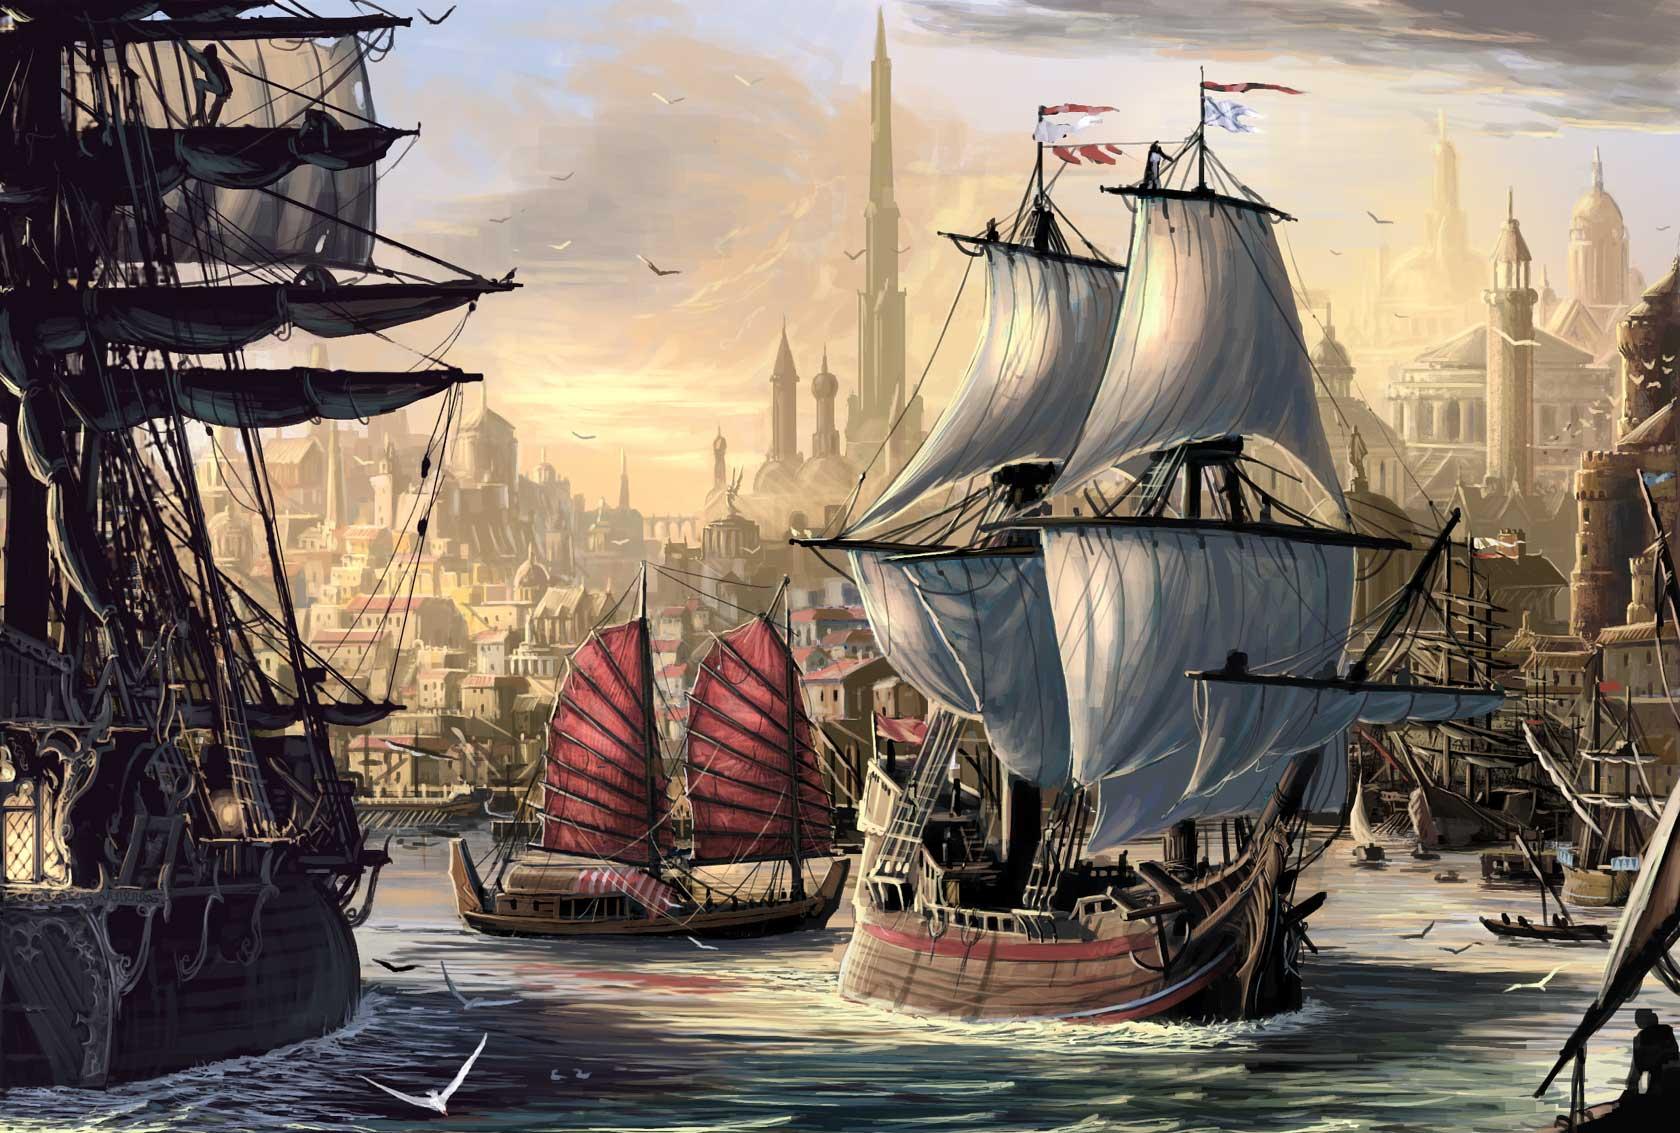 Valonia docks